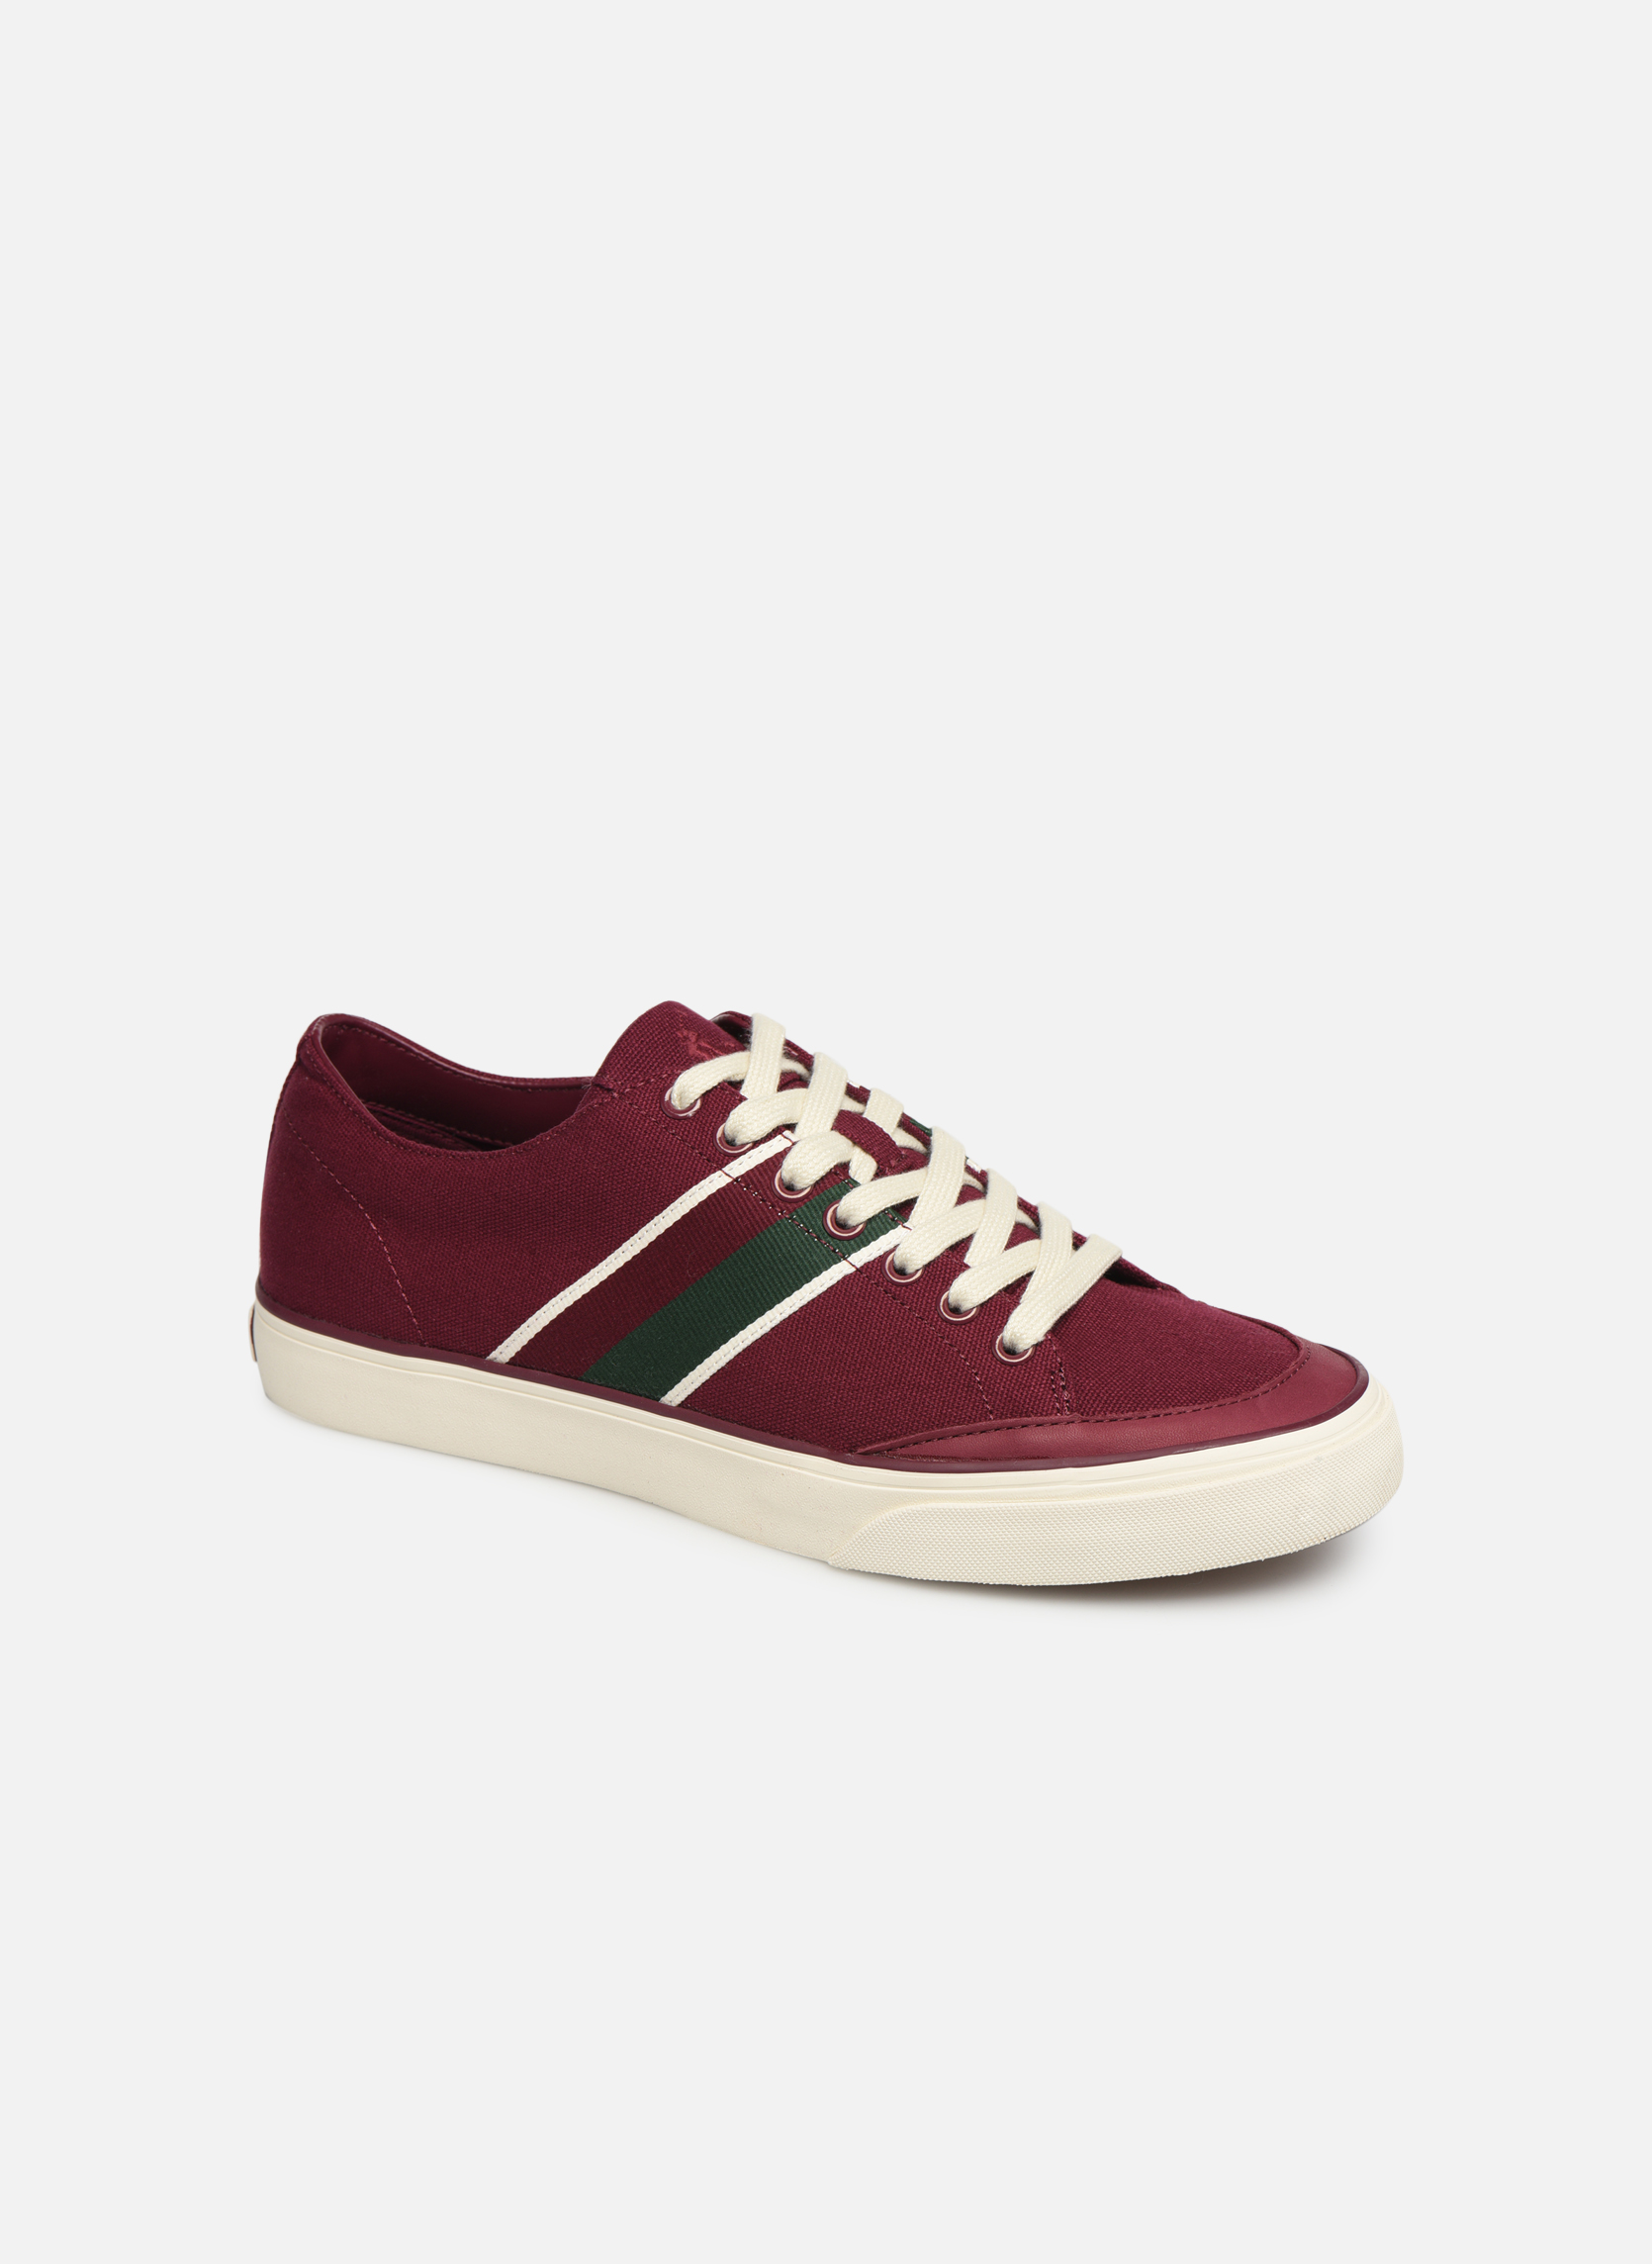 Sneakers Polo Ralph Lauren Bordeaux